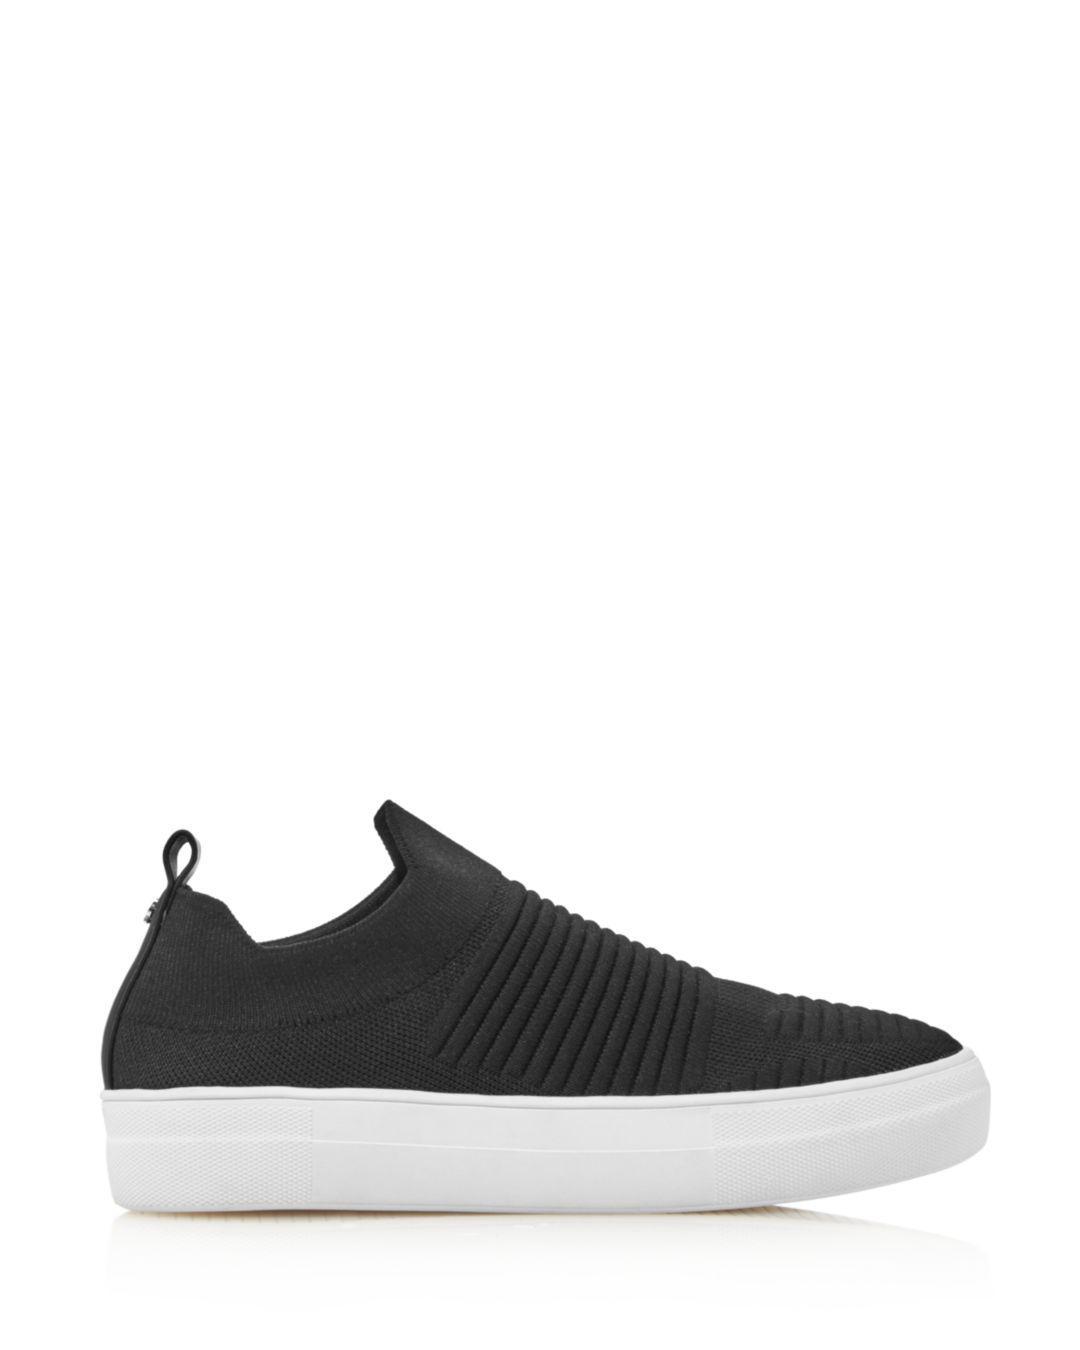 Kate Spade Women's Gerrard Knit Slip-on Platform Sneakers in Black